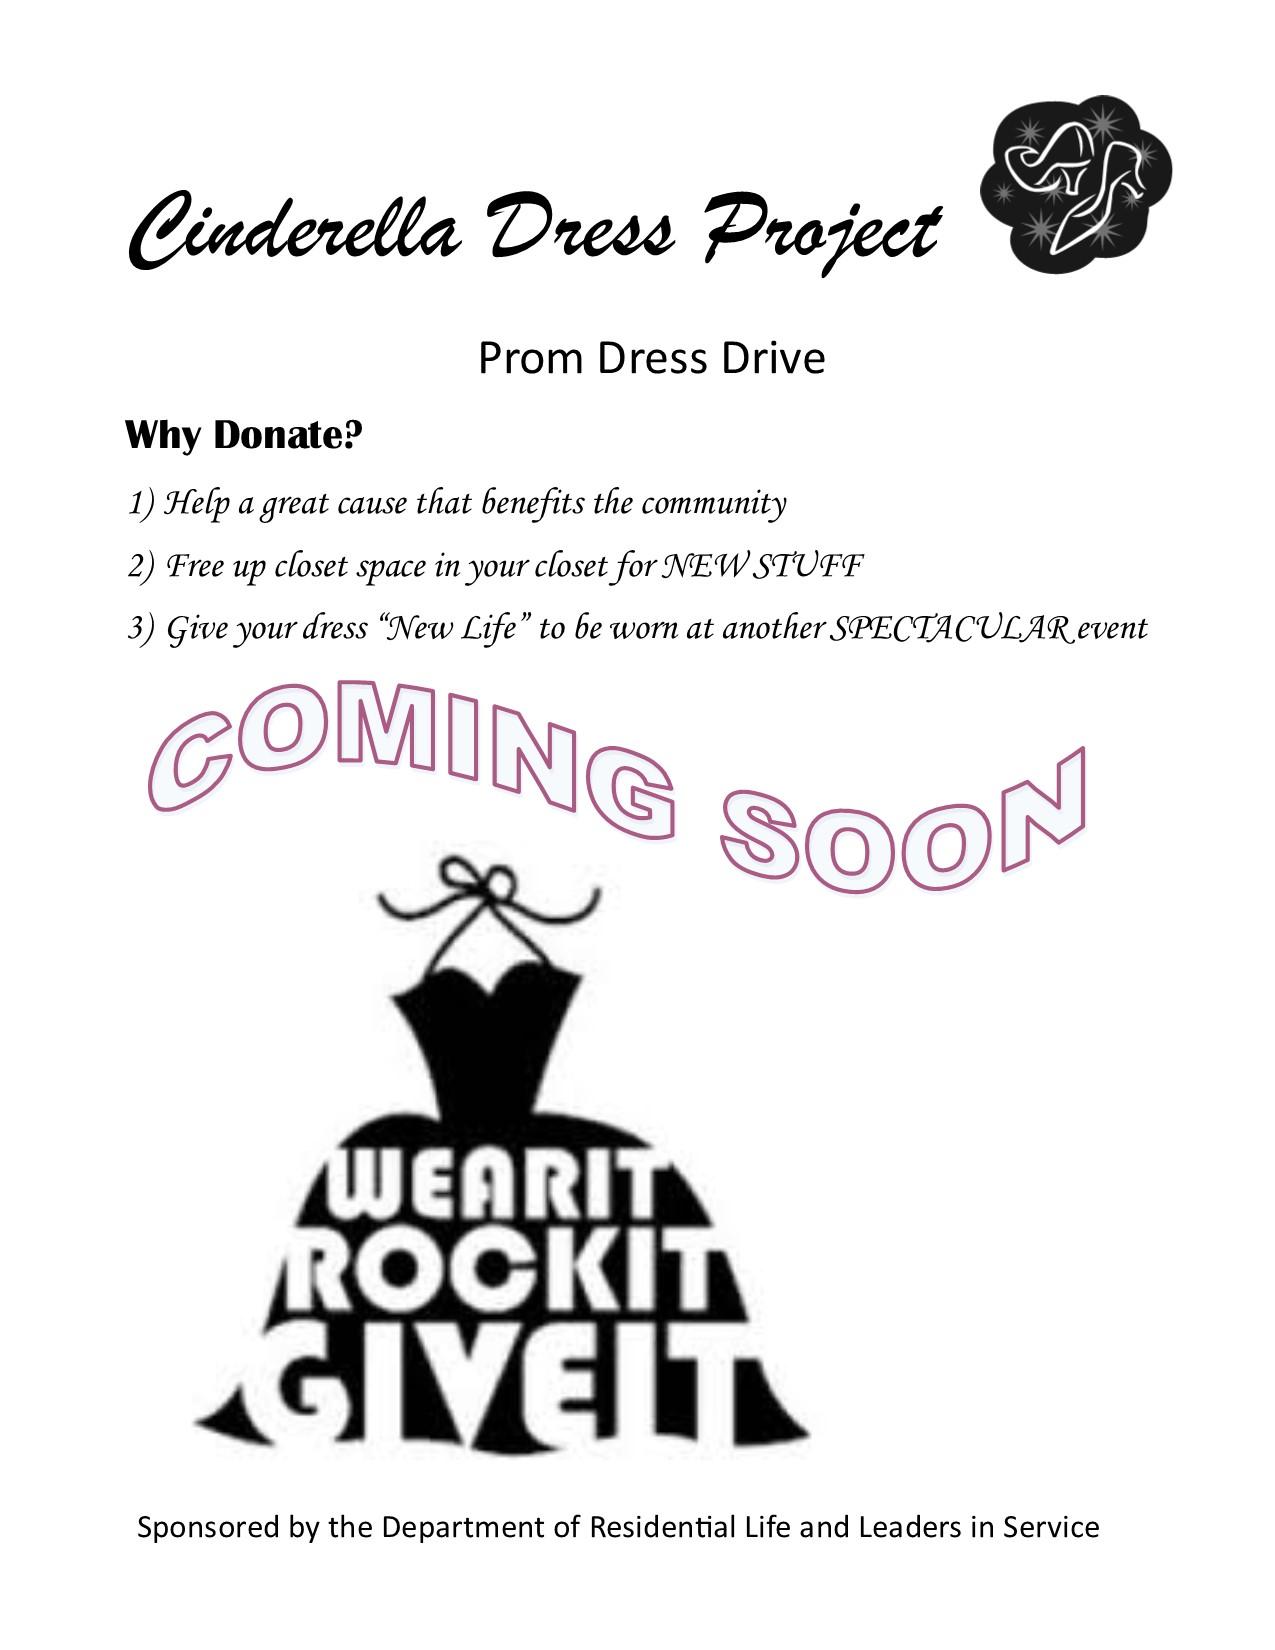 Cinderella Dress Project Myinvolvement